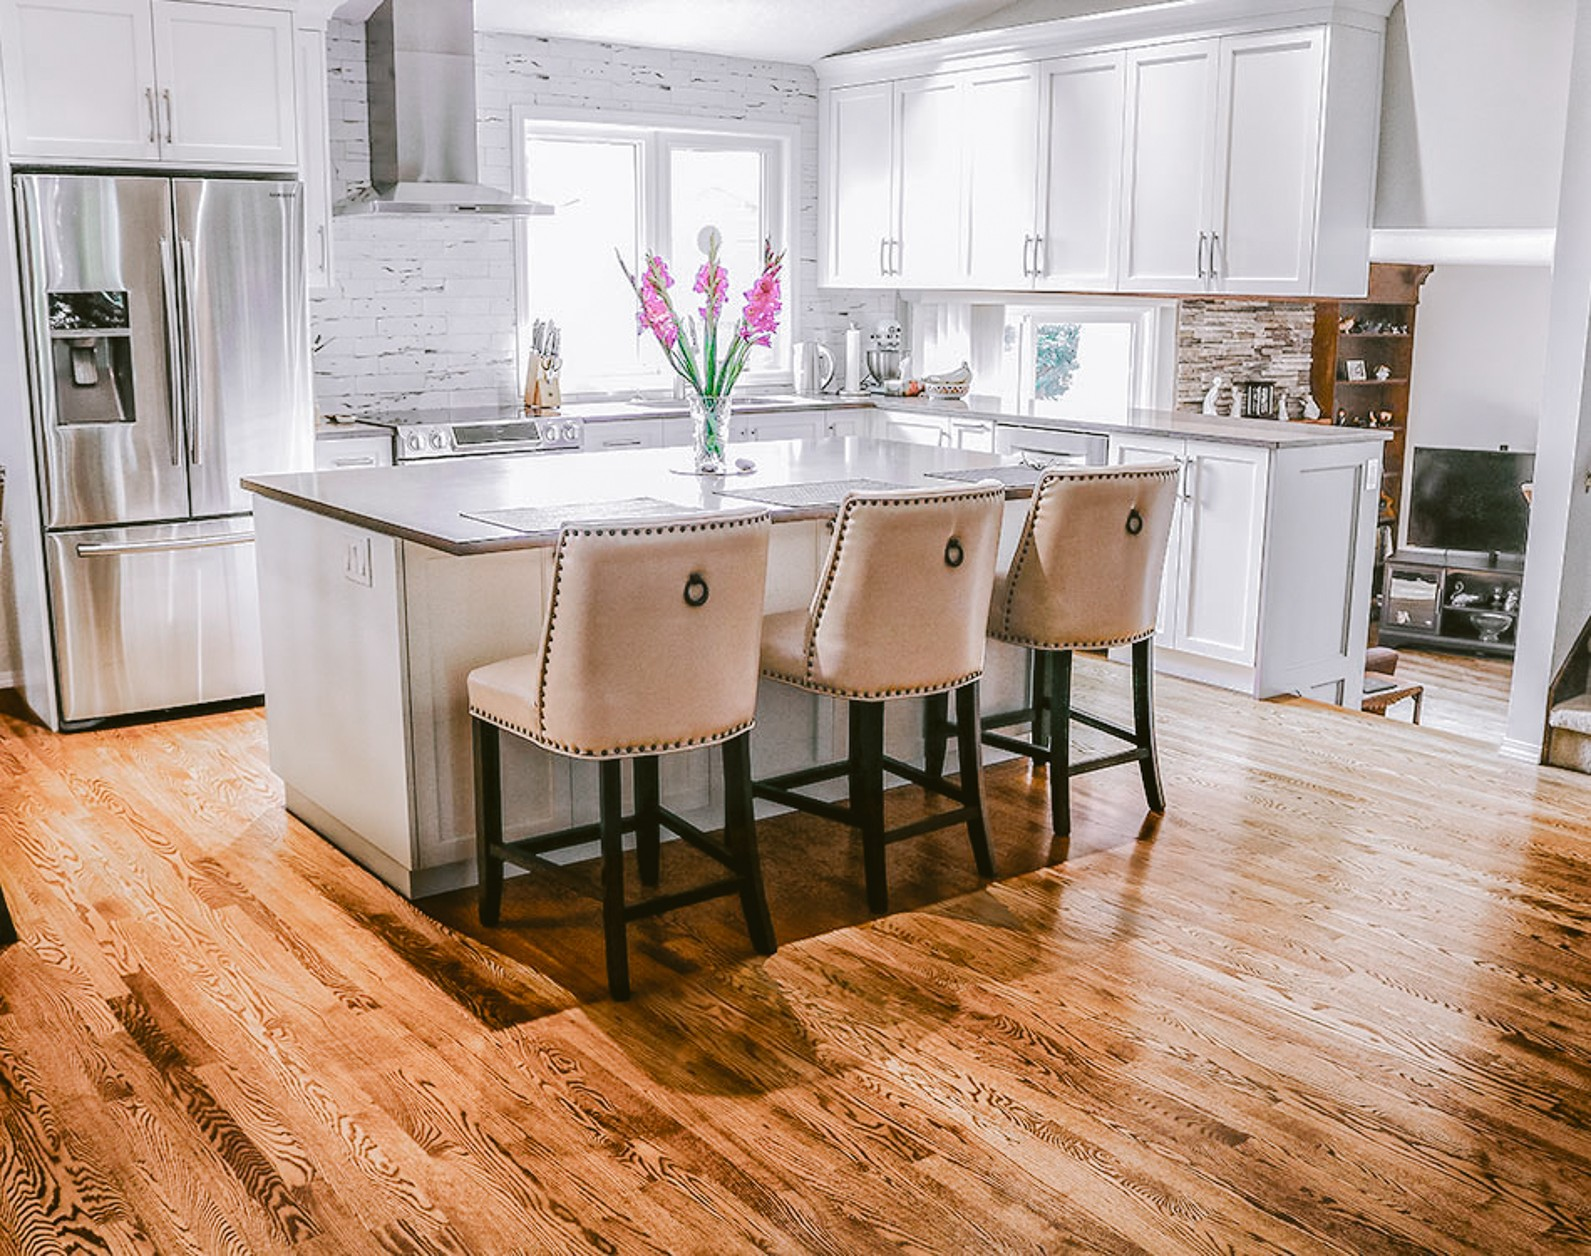 Kitchen interiors | Floorscapes